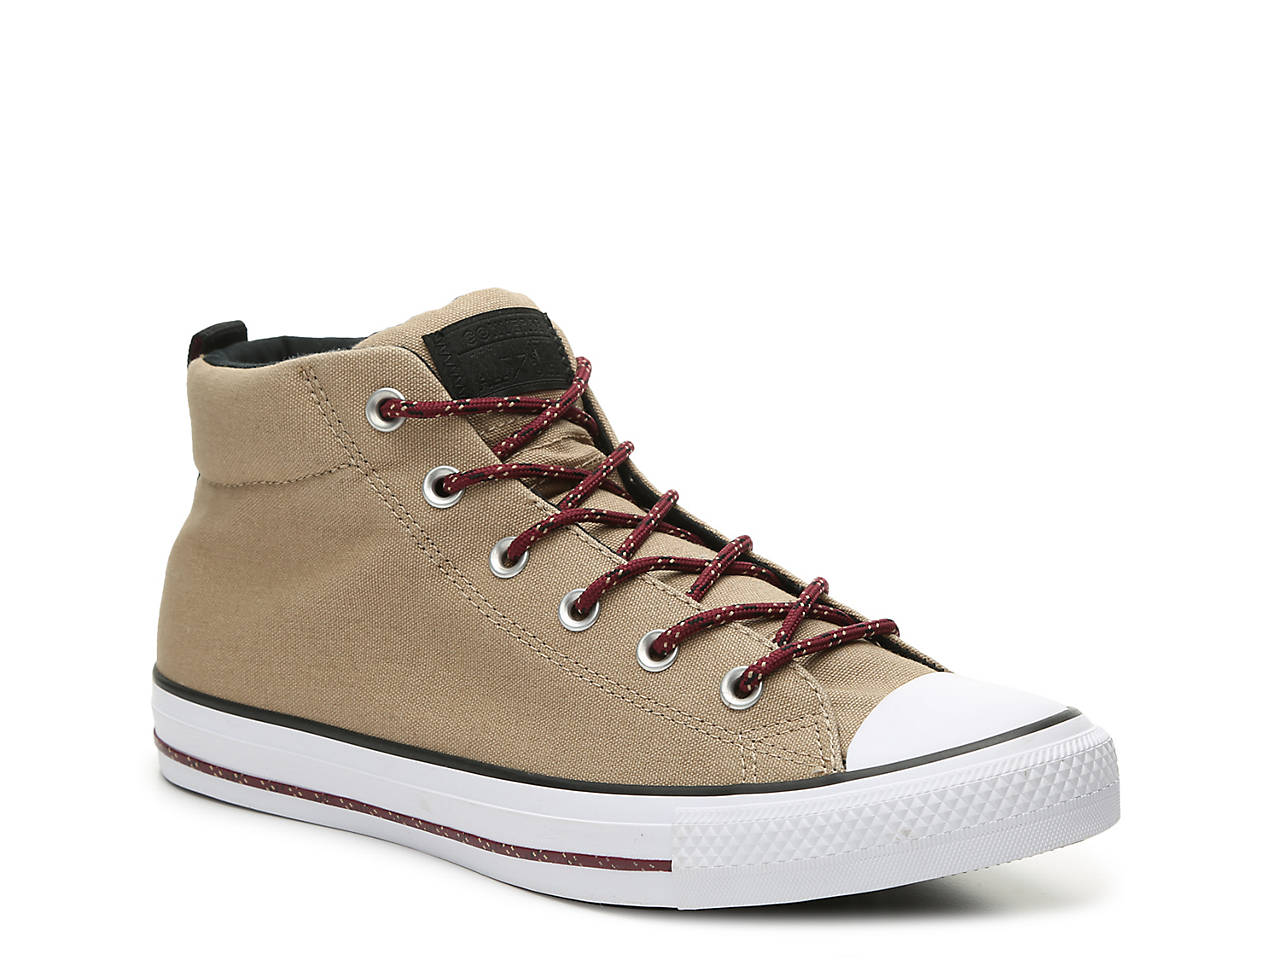 933188f51b217f Converse Chuck Taylor All Star Street Mid-Top Sneaker - Men s Men s ...